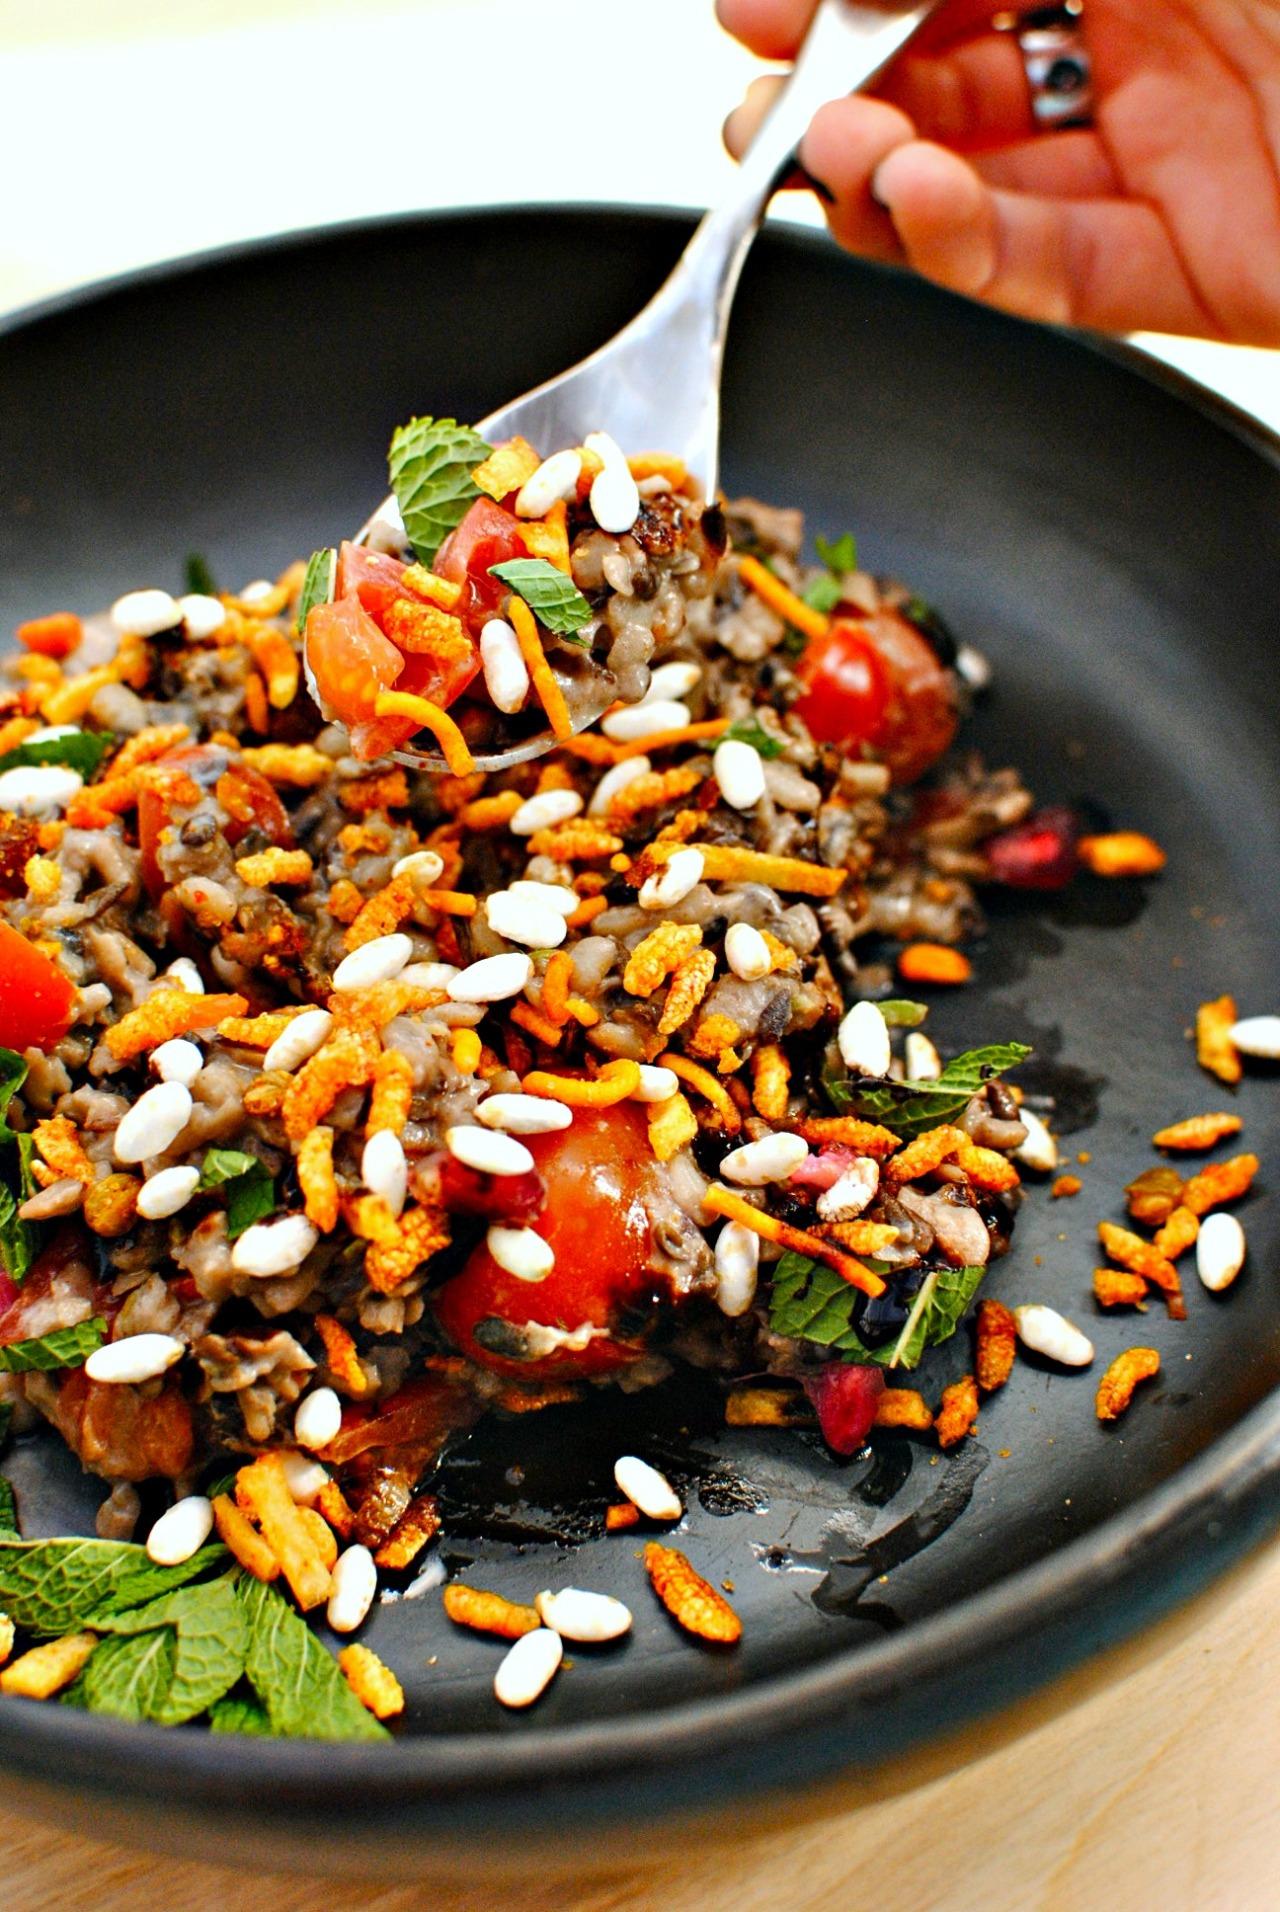 dal-with-jhal-muri-and-tamarind-sauce